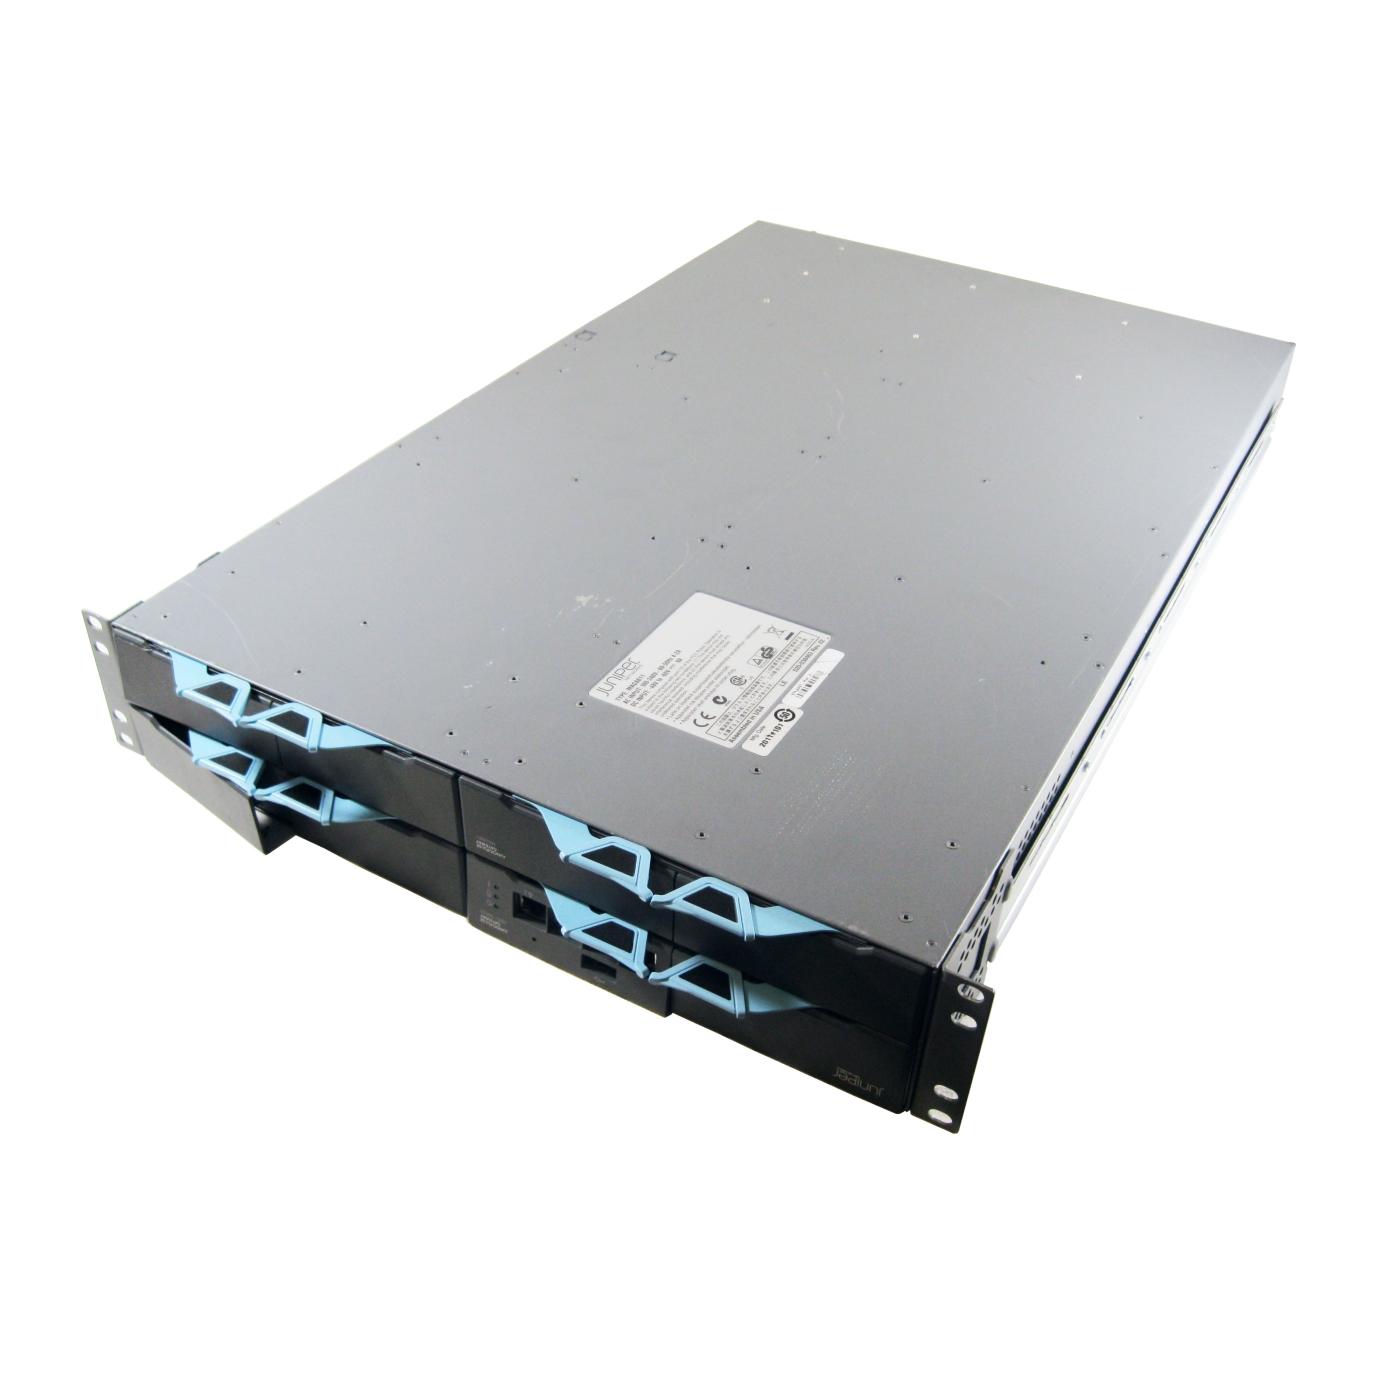 Juniper MAG6611 Junos Pulse 1 x ST9250610NS 1 x FSAK750S-F4 Secure Access Blade